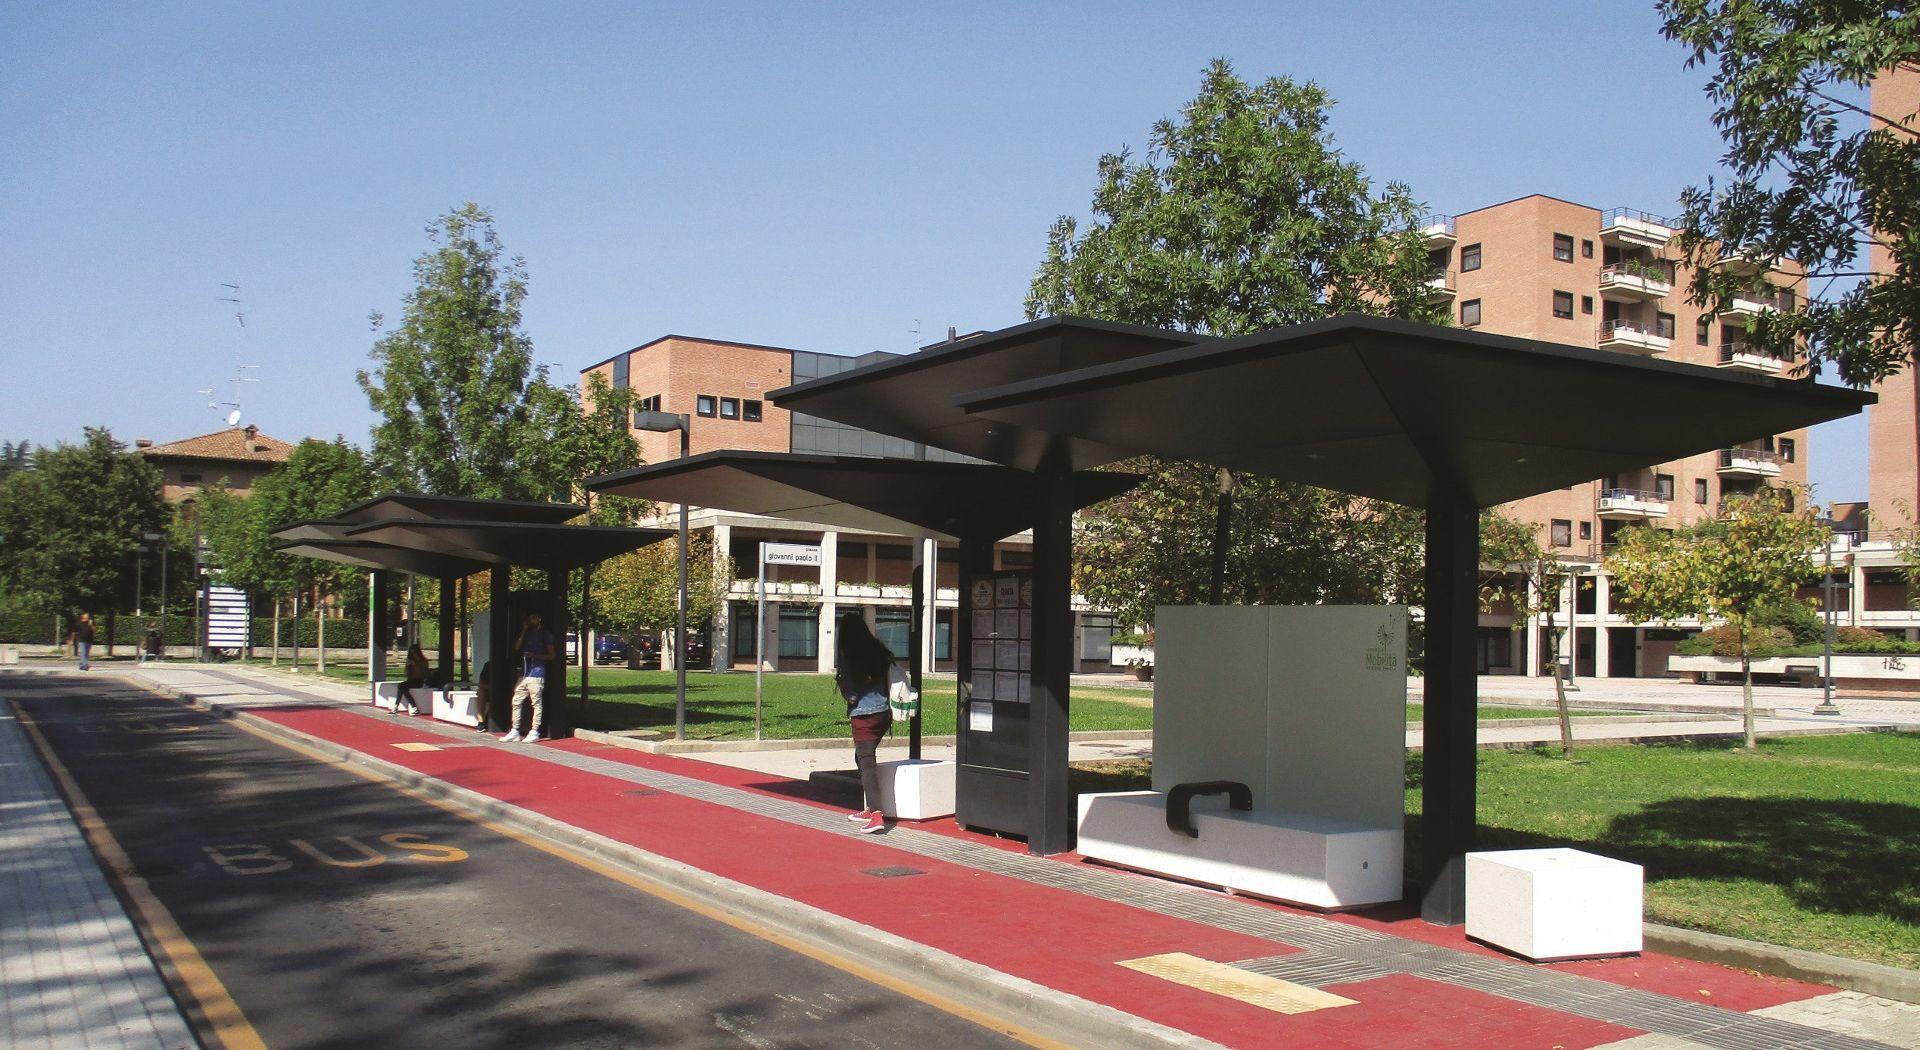 GPDUE abris voyageurs METALCO fabricant mobilier urbain design